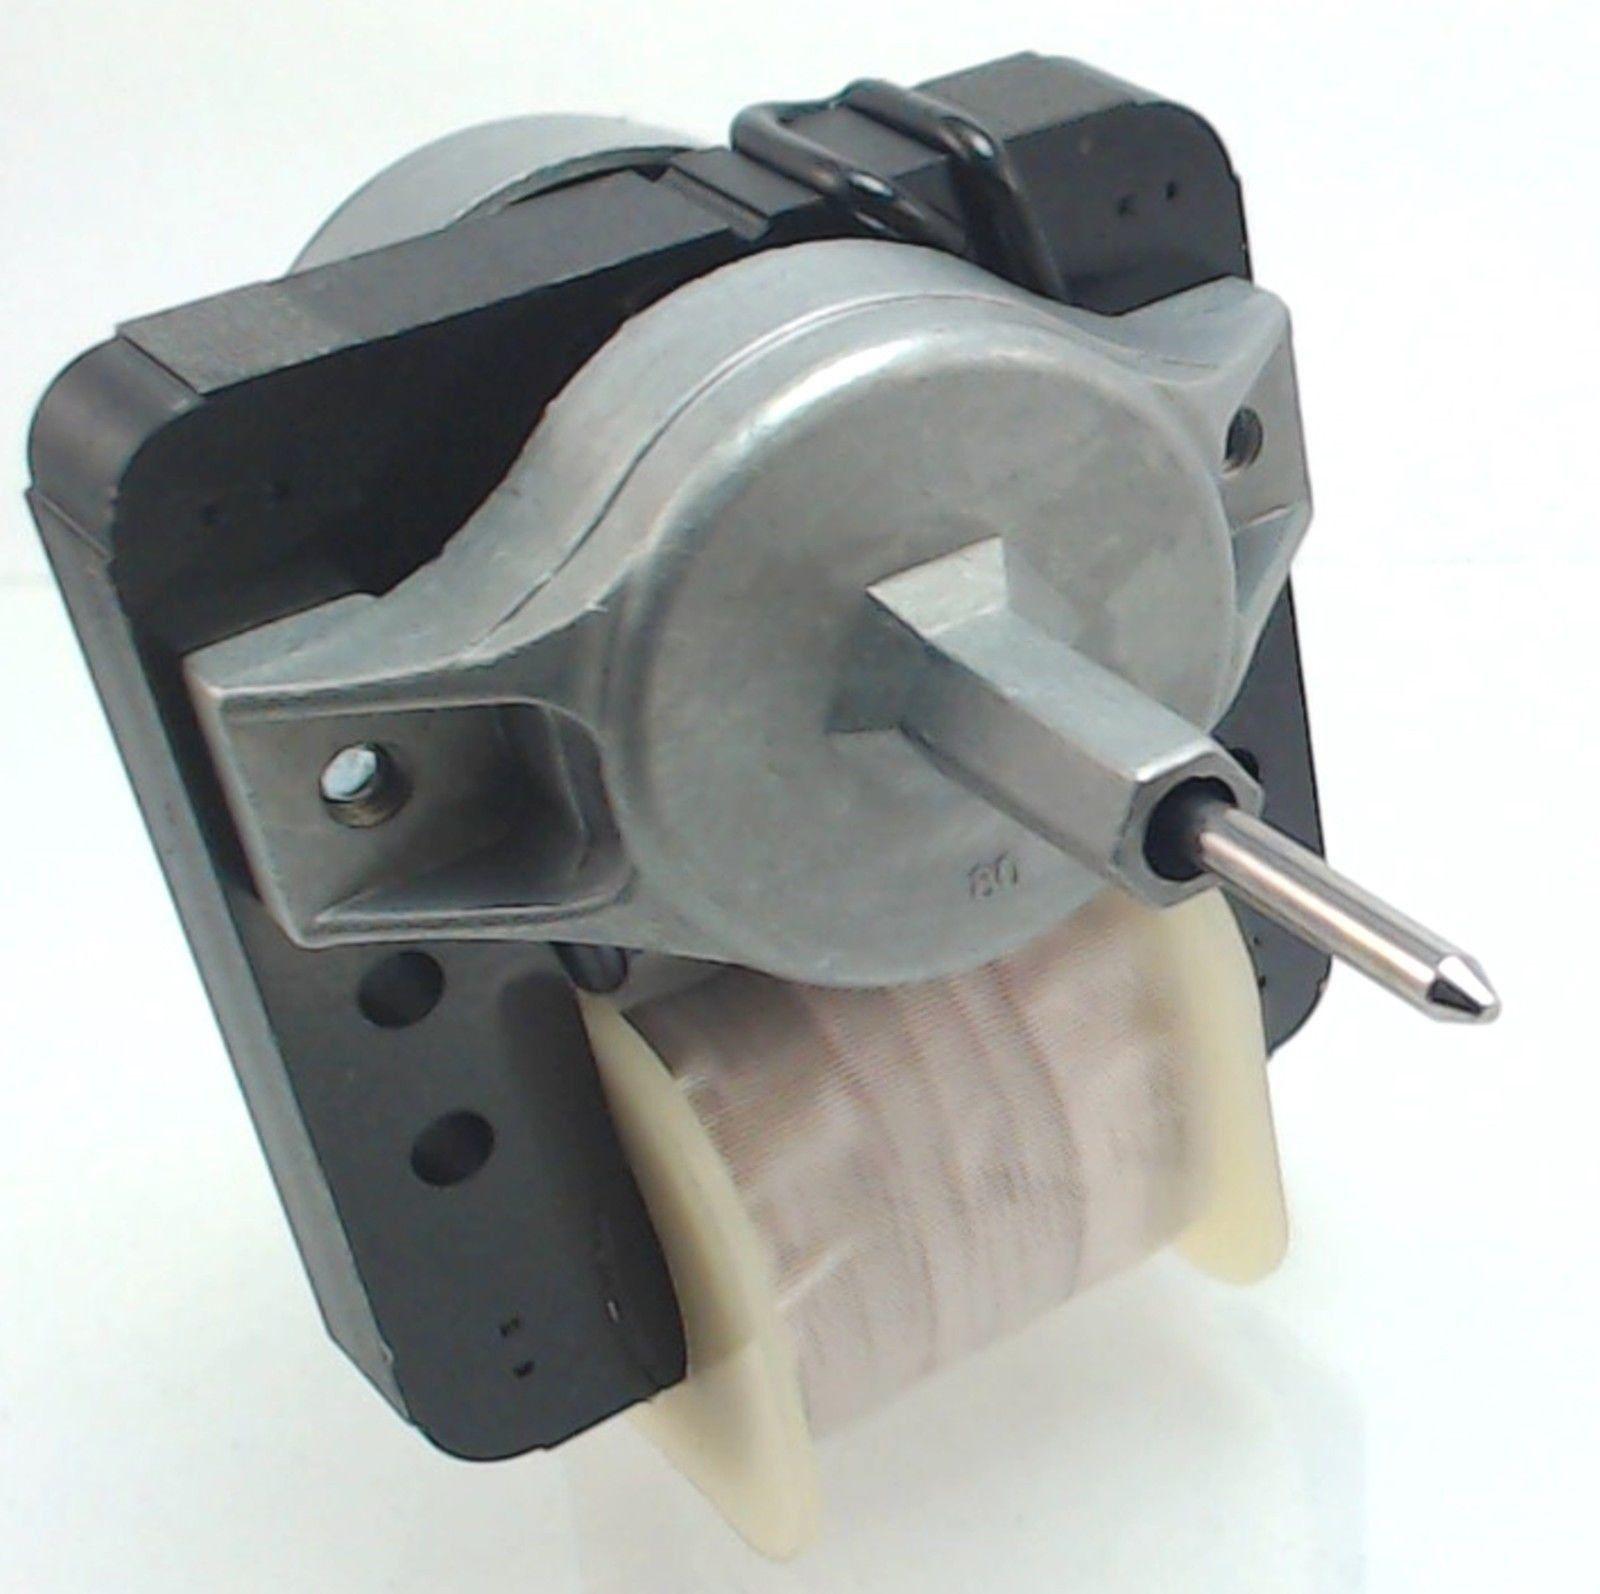 Refrigerator evaporator motor for whirlpool sears for How to test refrigerator evaporator fan motor